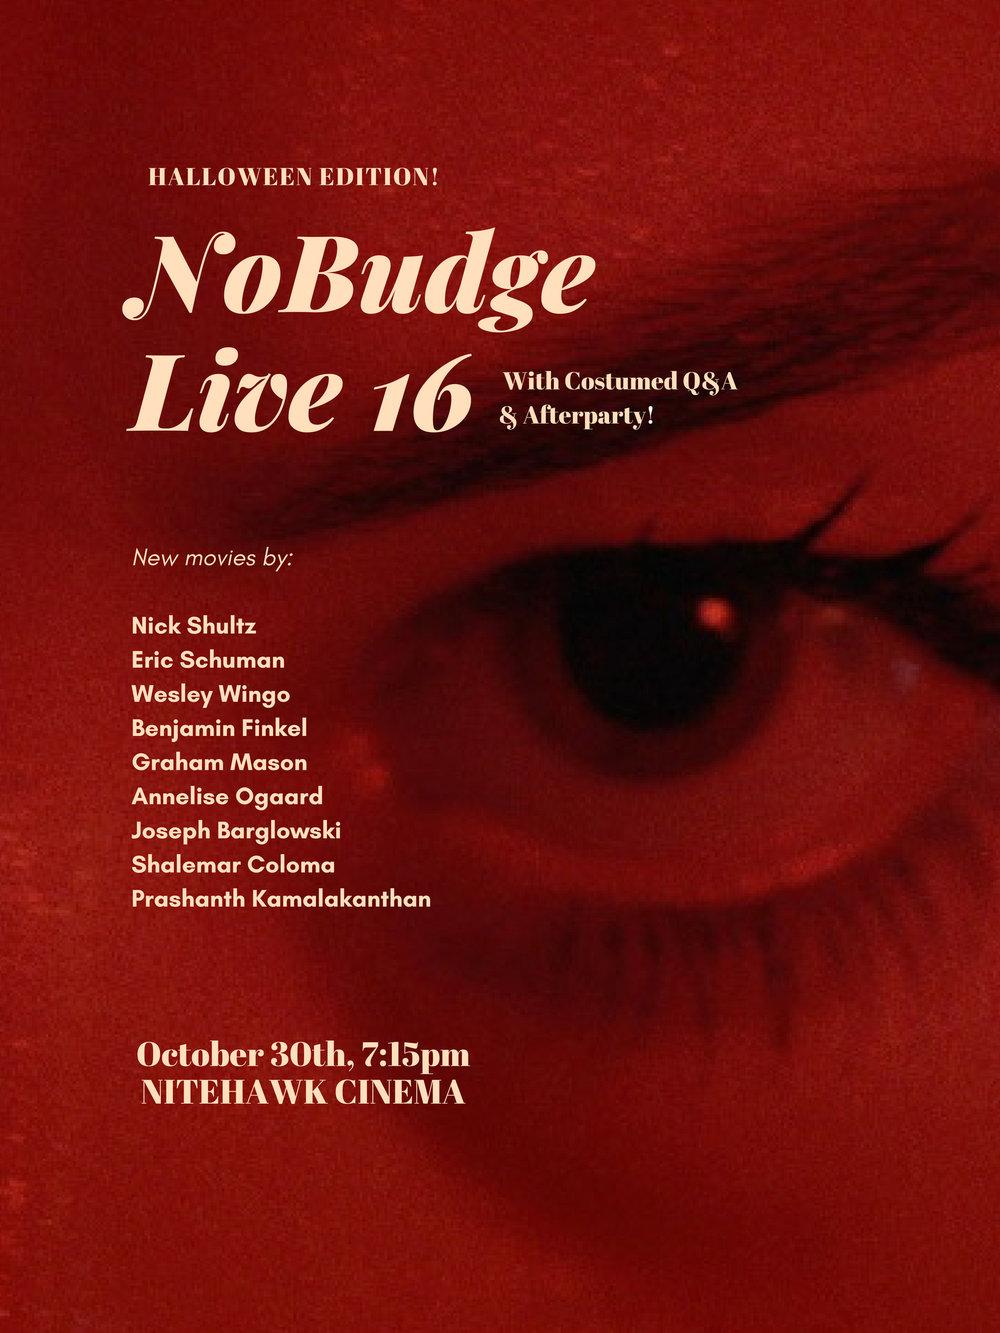 nobudge live 16 - halloween edition — nobudge